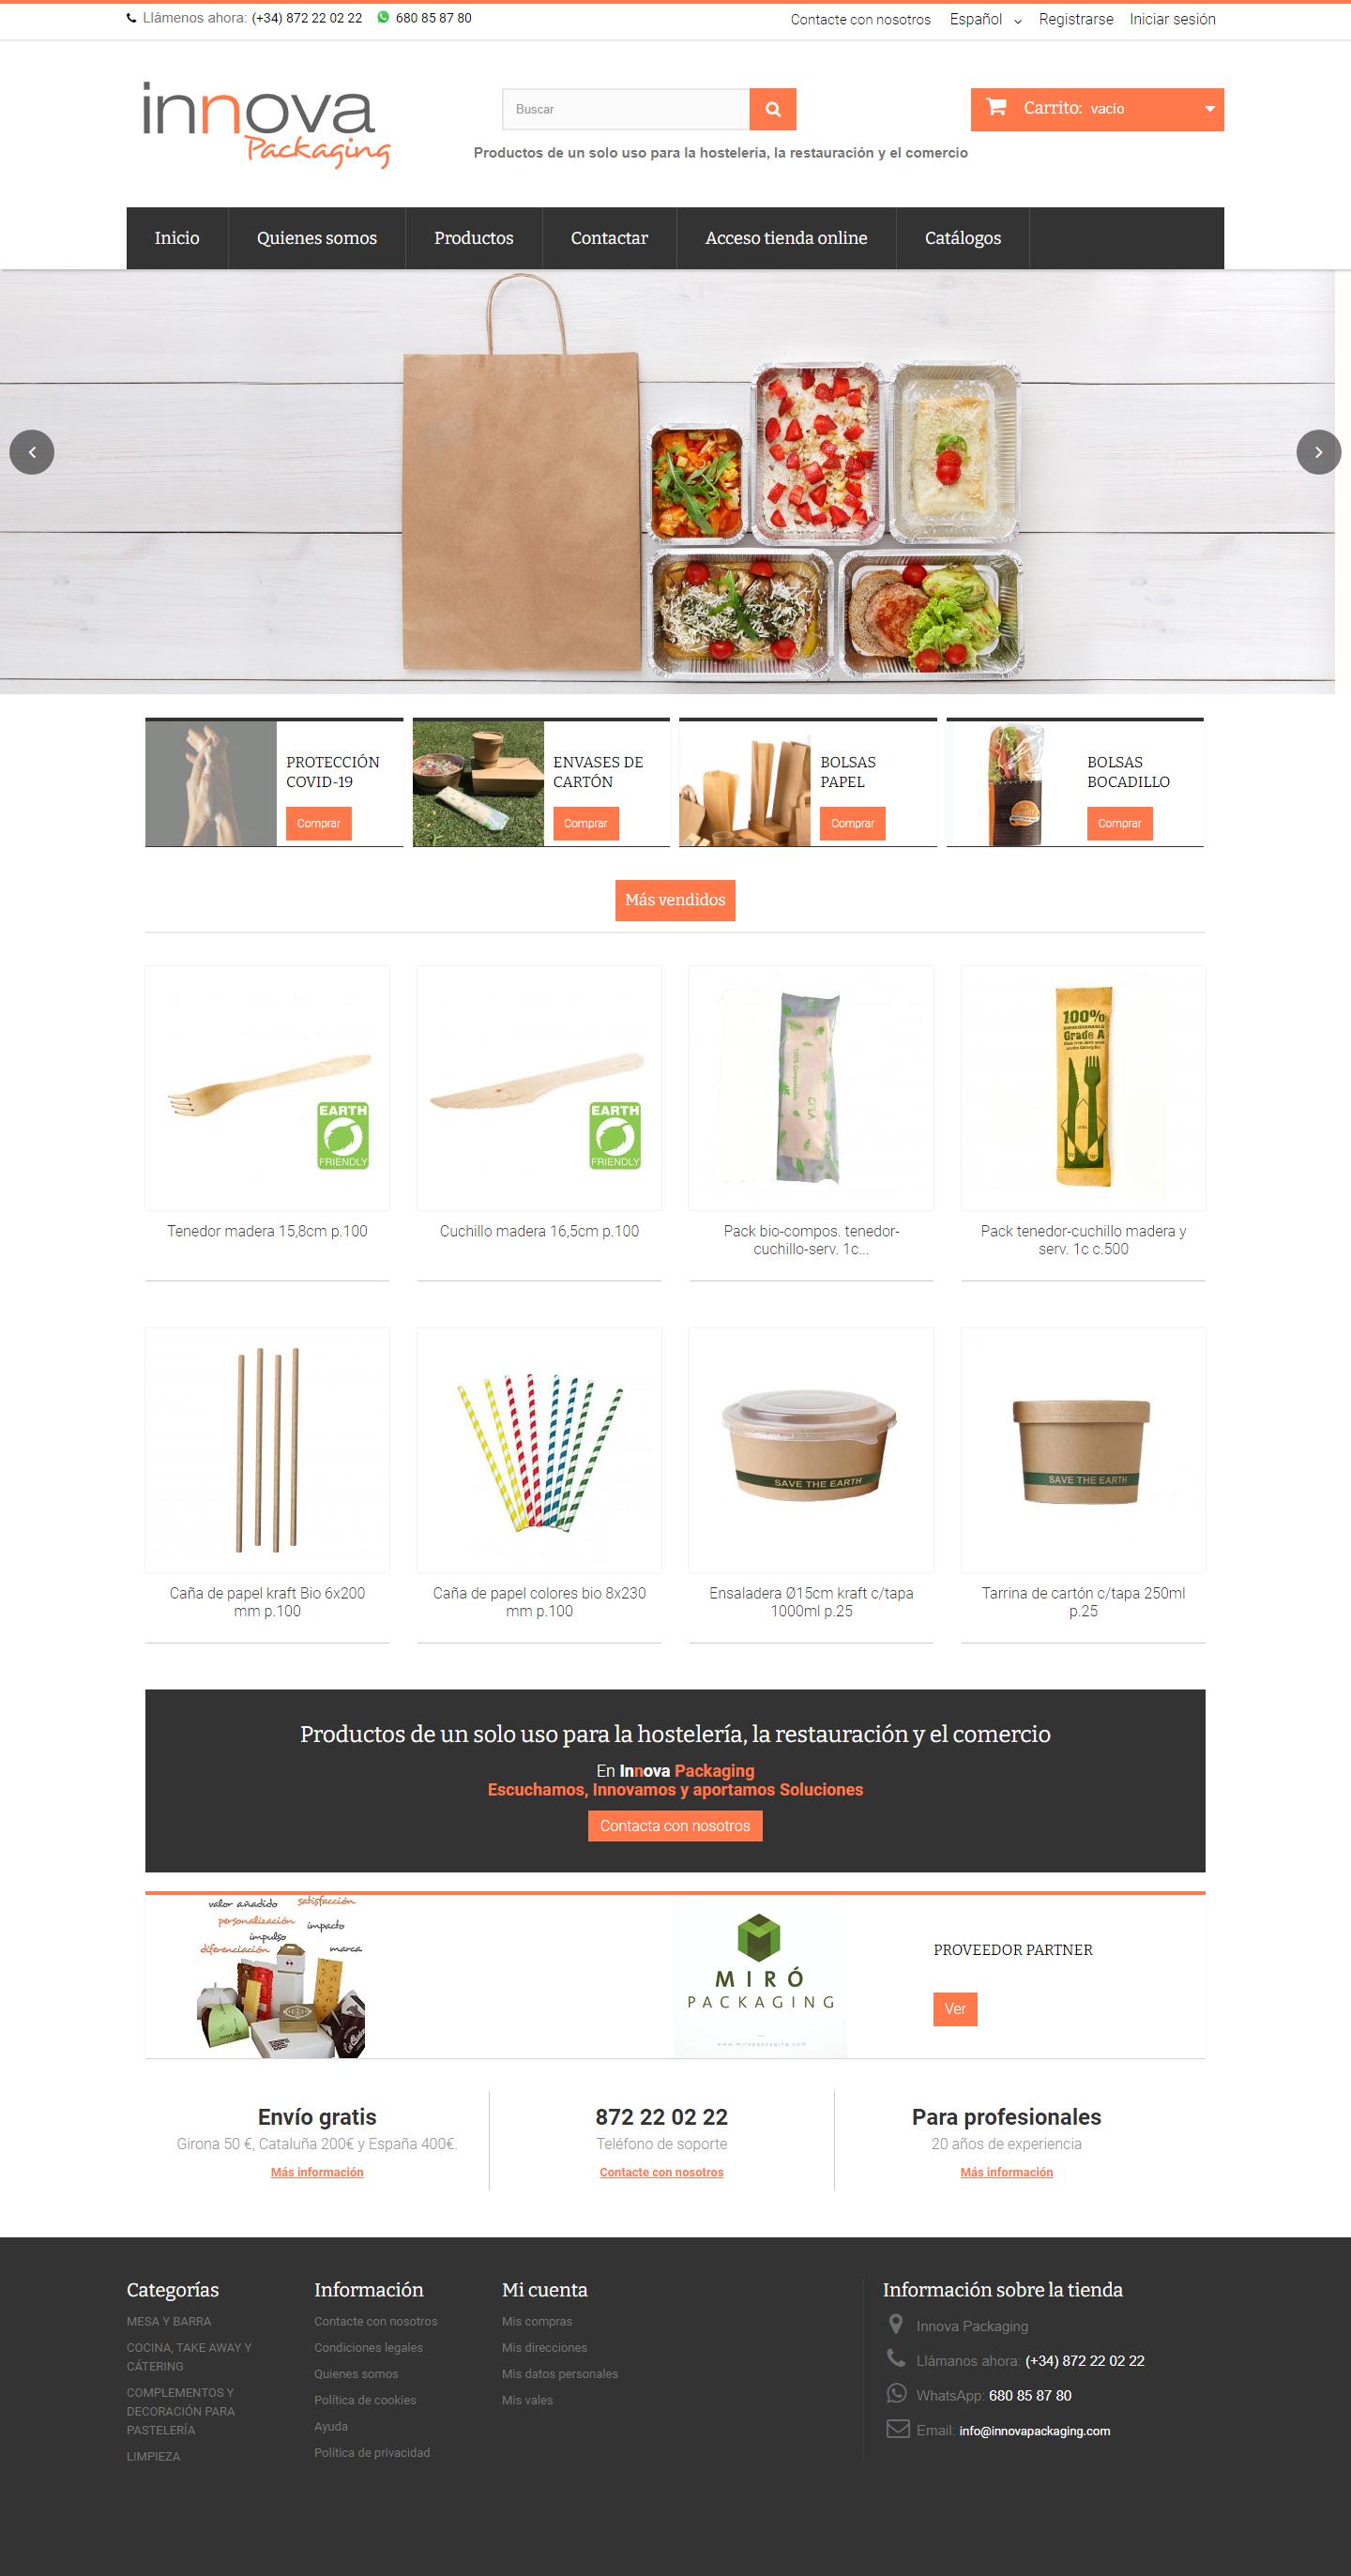 Tienda virtual Innovapackaging